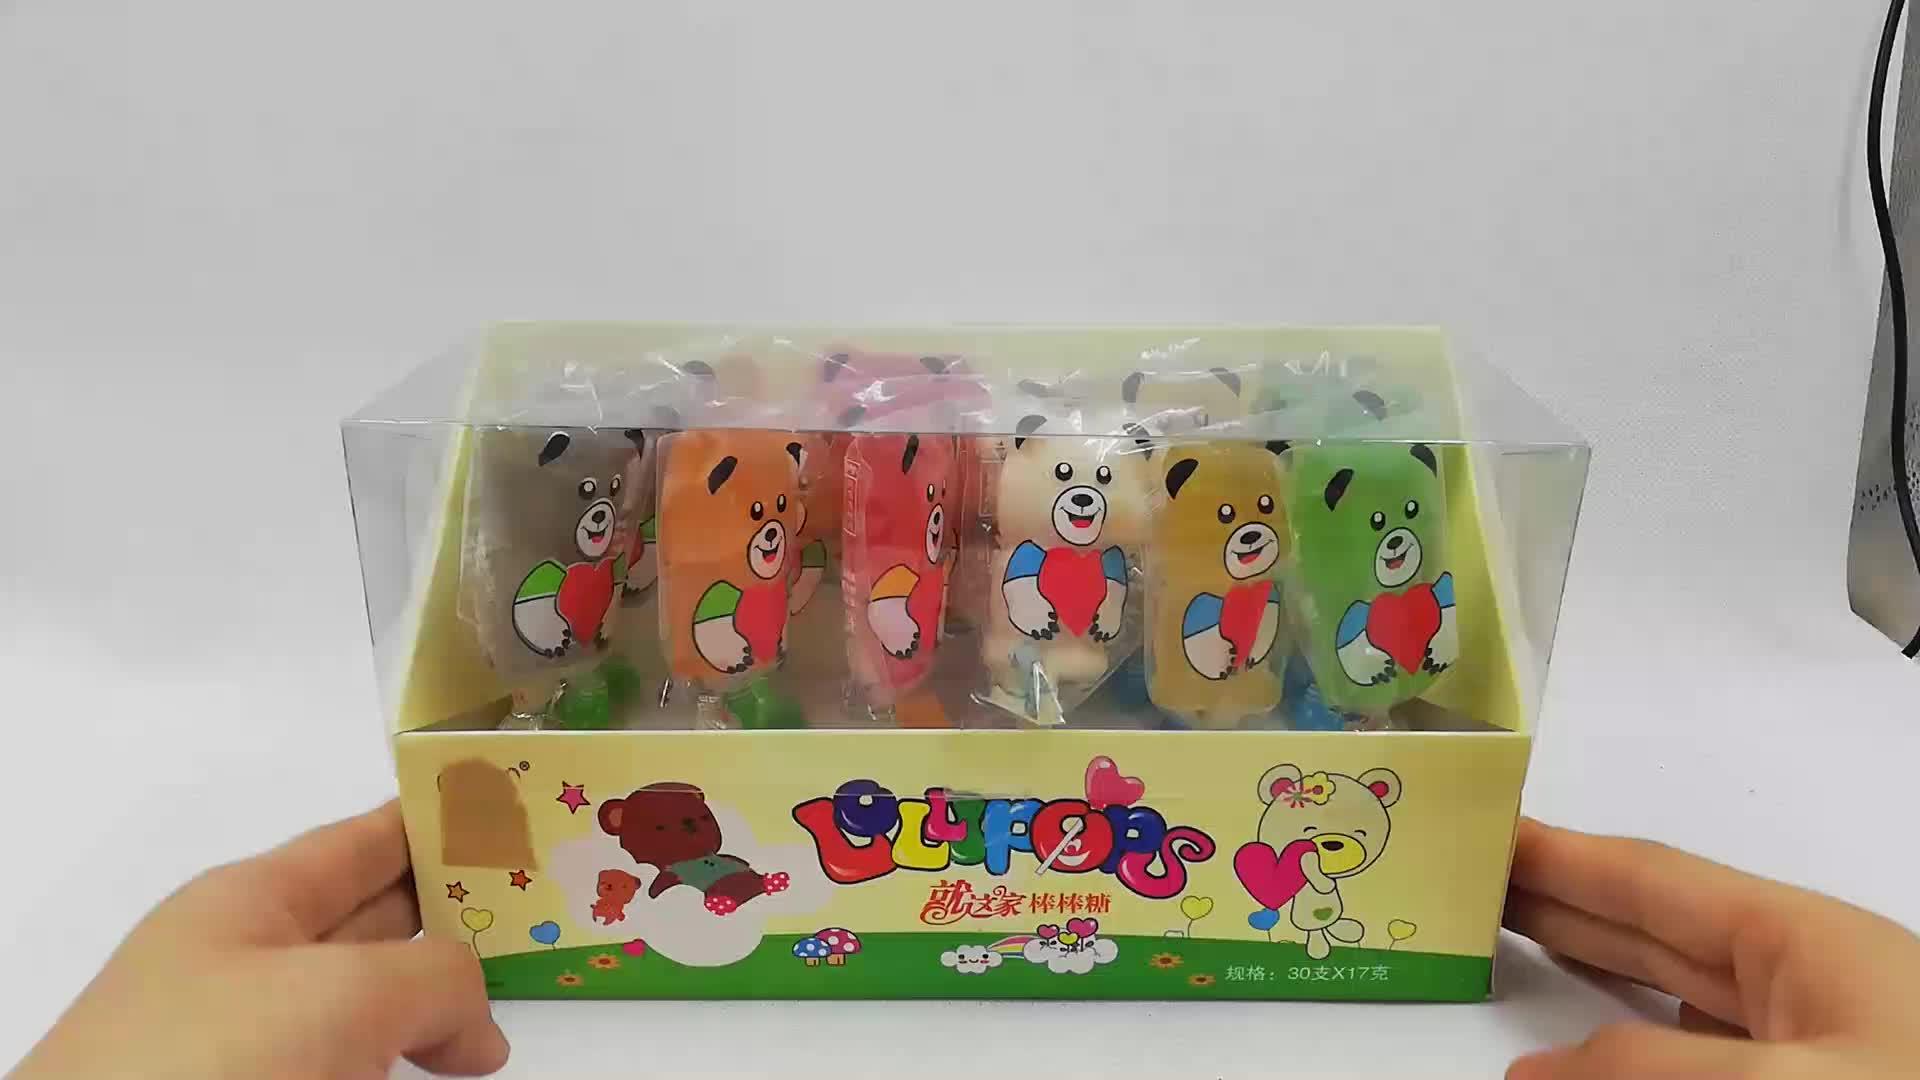 Halal fruit lollipop schattige konijn vorm jelly pop gummy candy zachte stok snoep